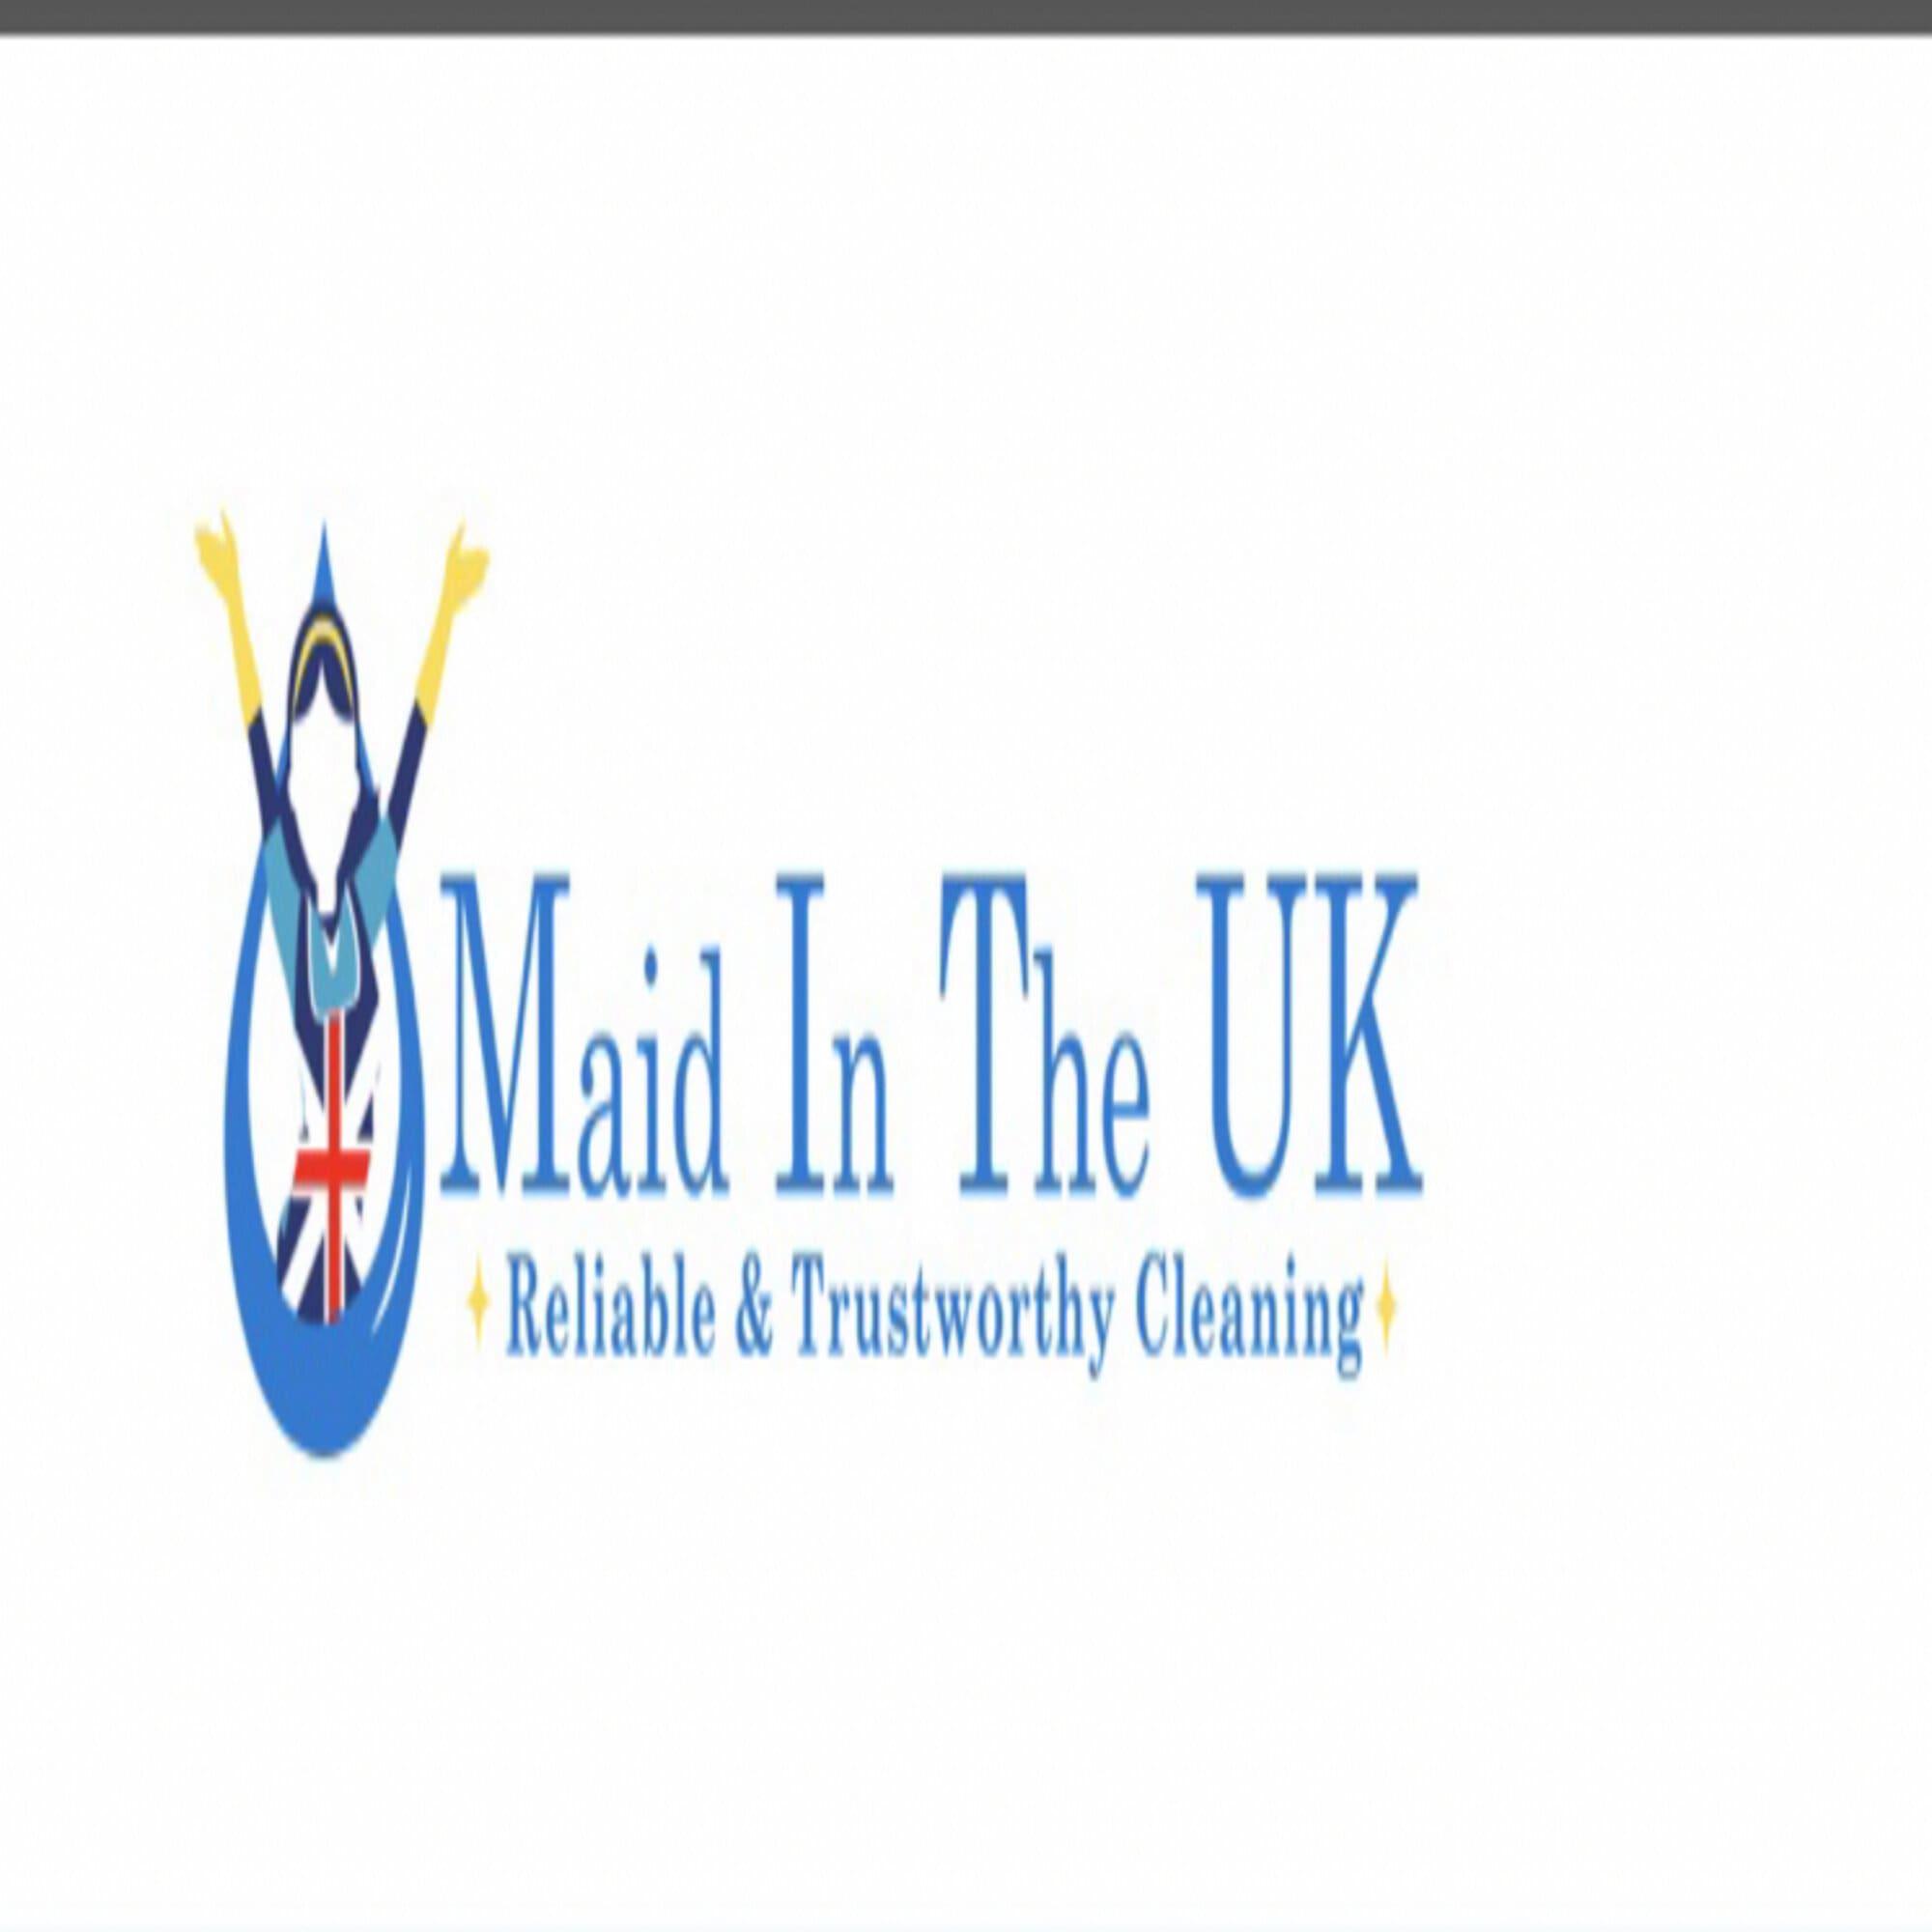 Maid in the UK Ltd